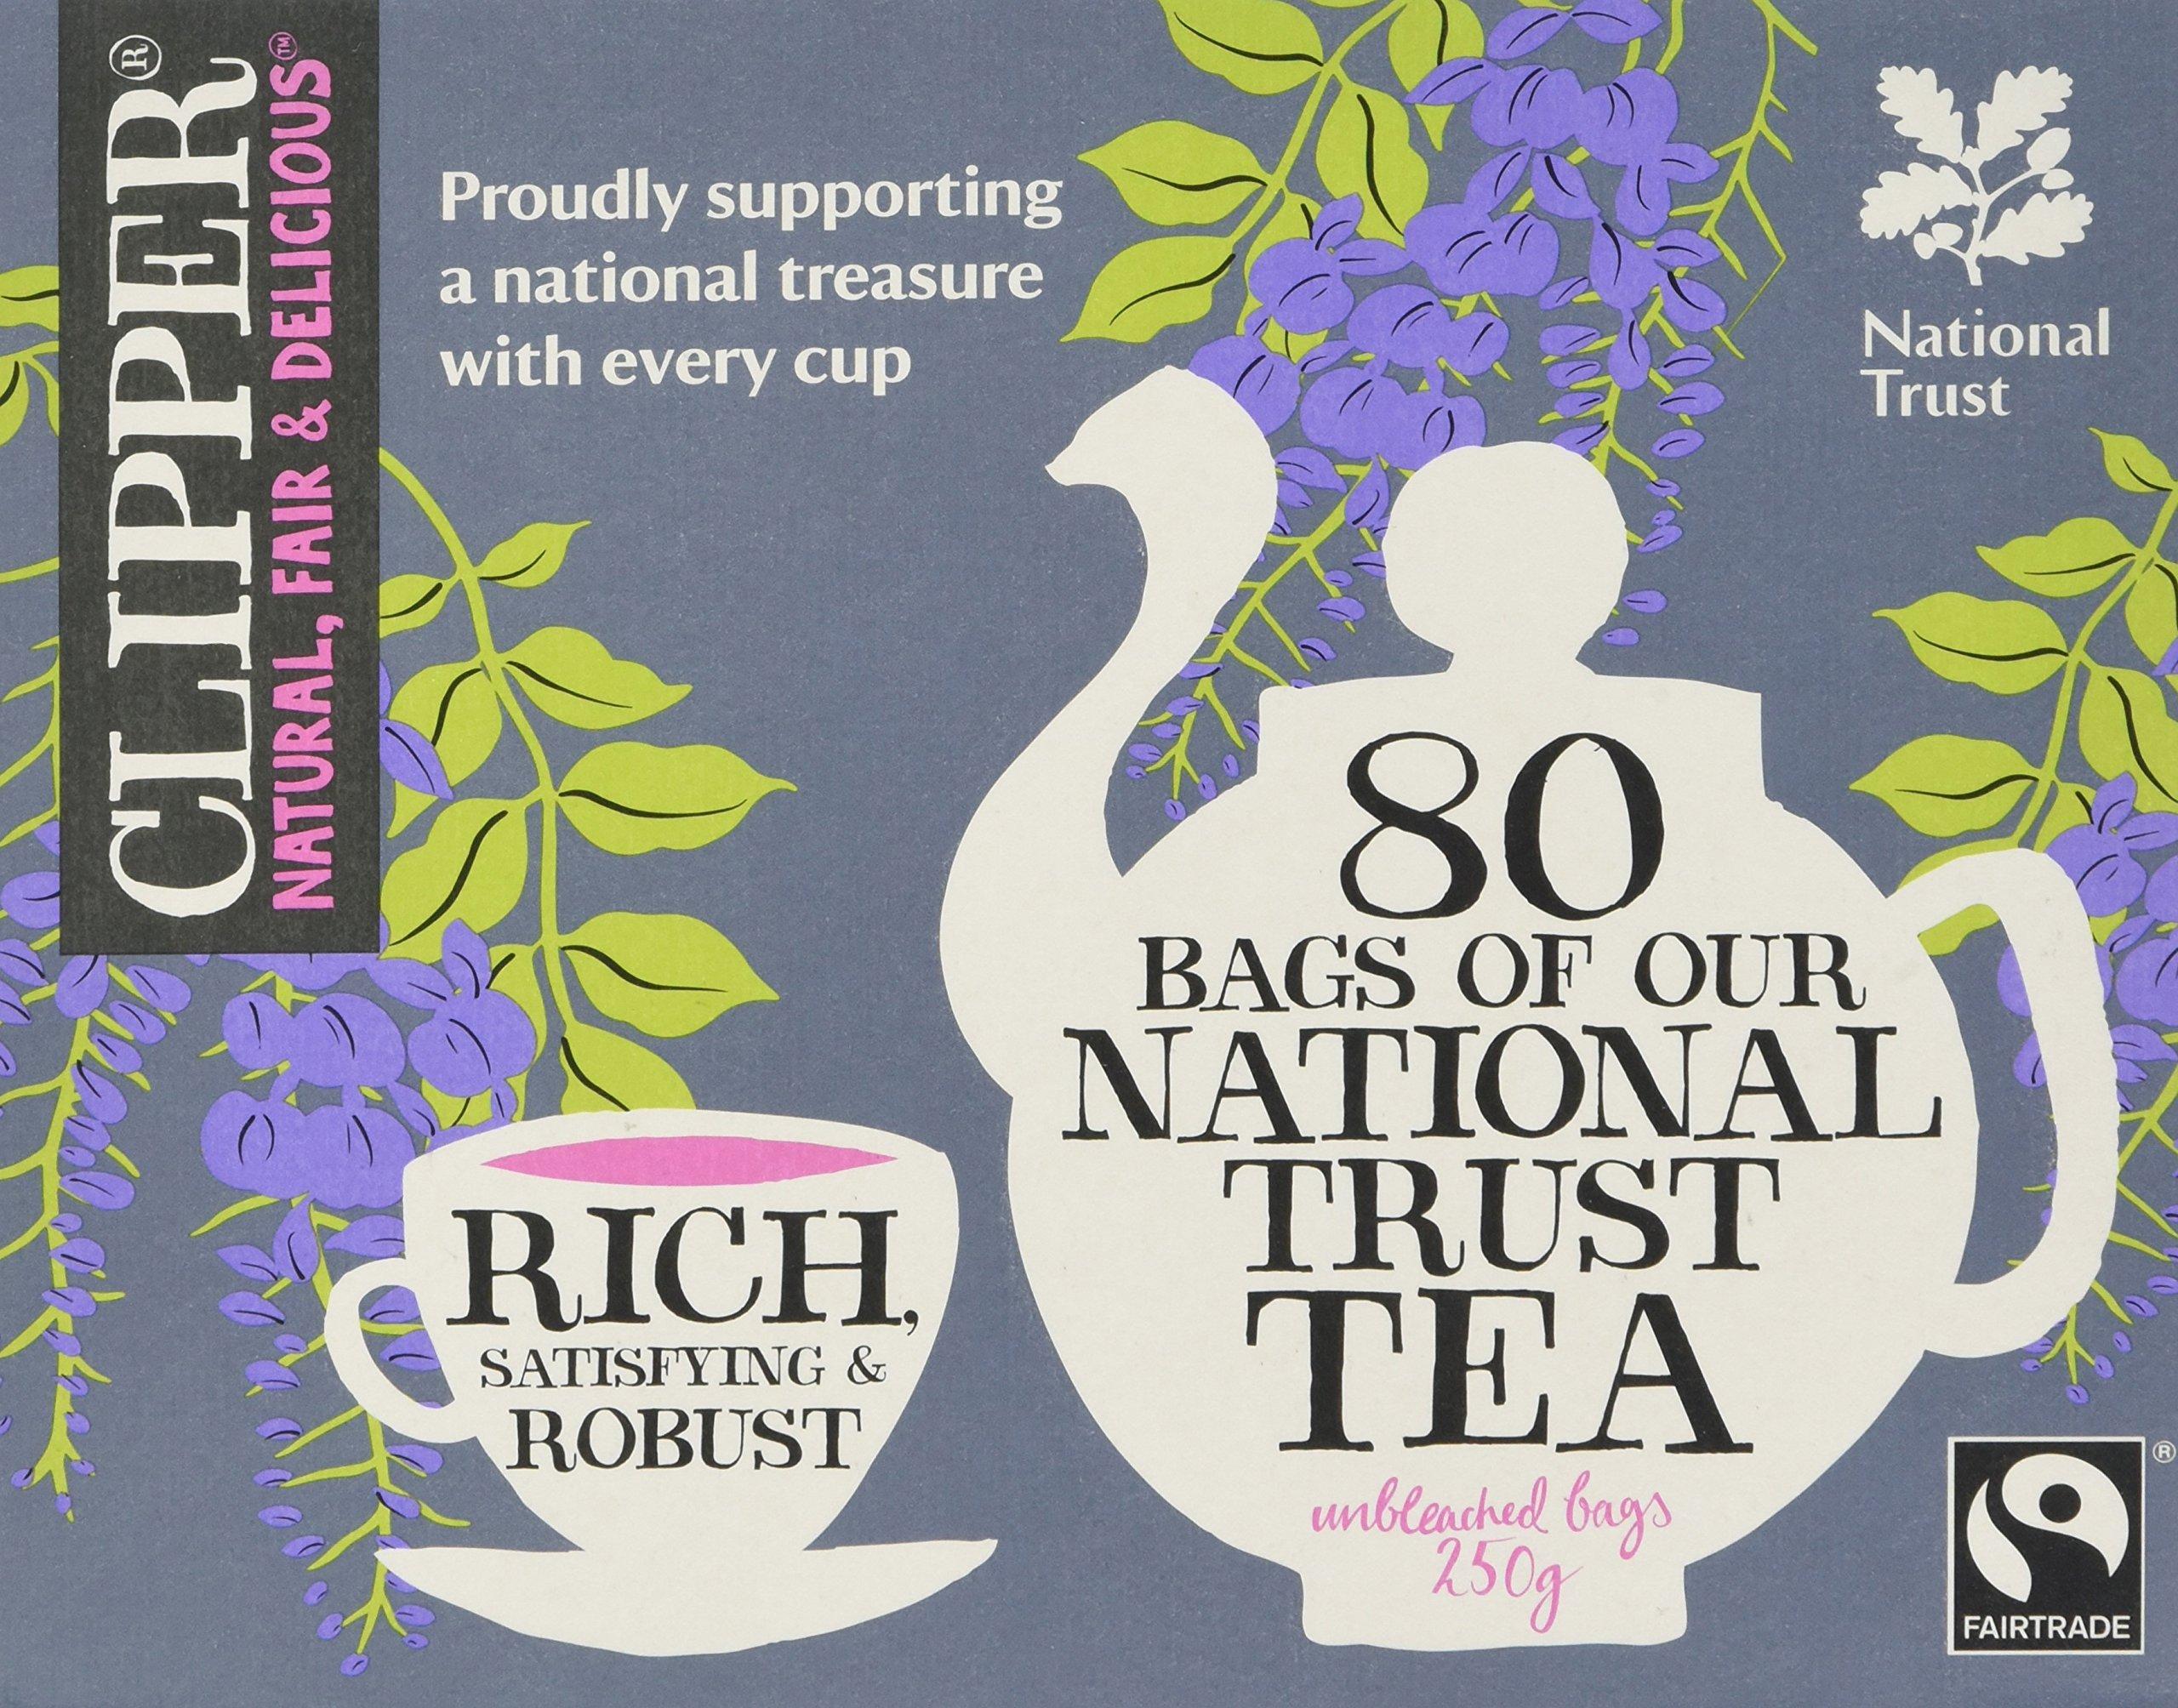 Clipper fairtrade national trust tea bundle (fairtrade, soil association) (black tea) (national trust) (6 packs of 80 bags) (480 bags) (brews in 2-4 minutes)